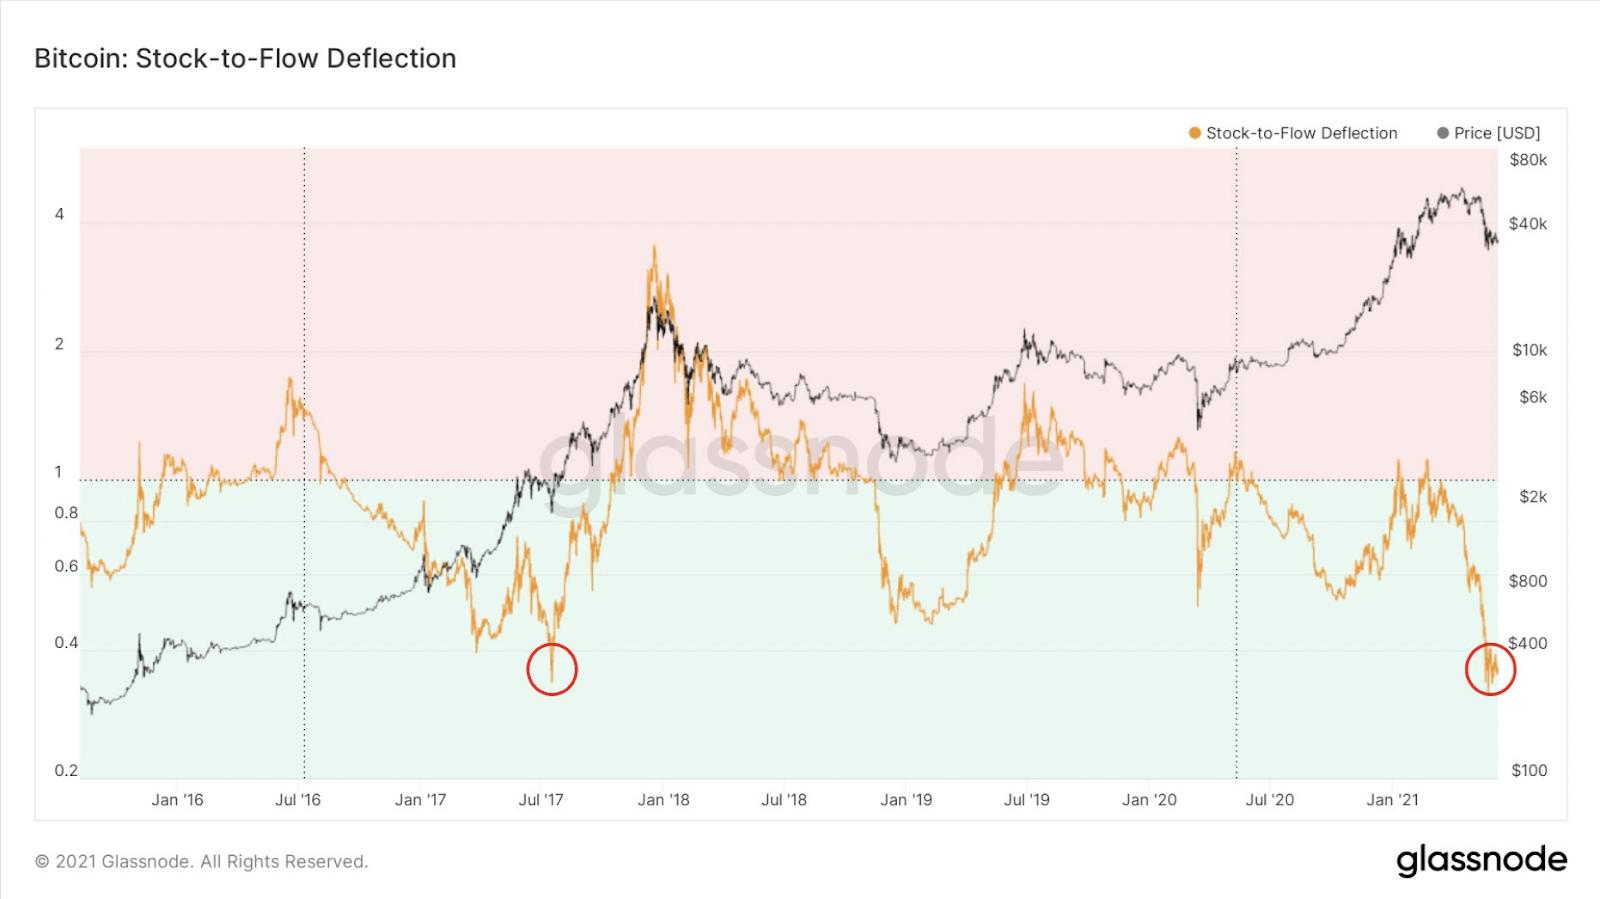 Bitcoin BTC Stock-to-Flow Deflection